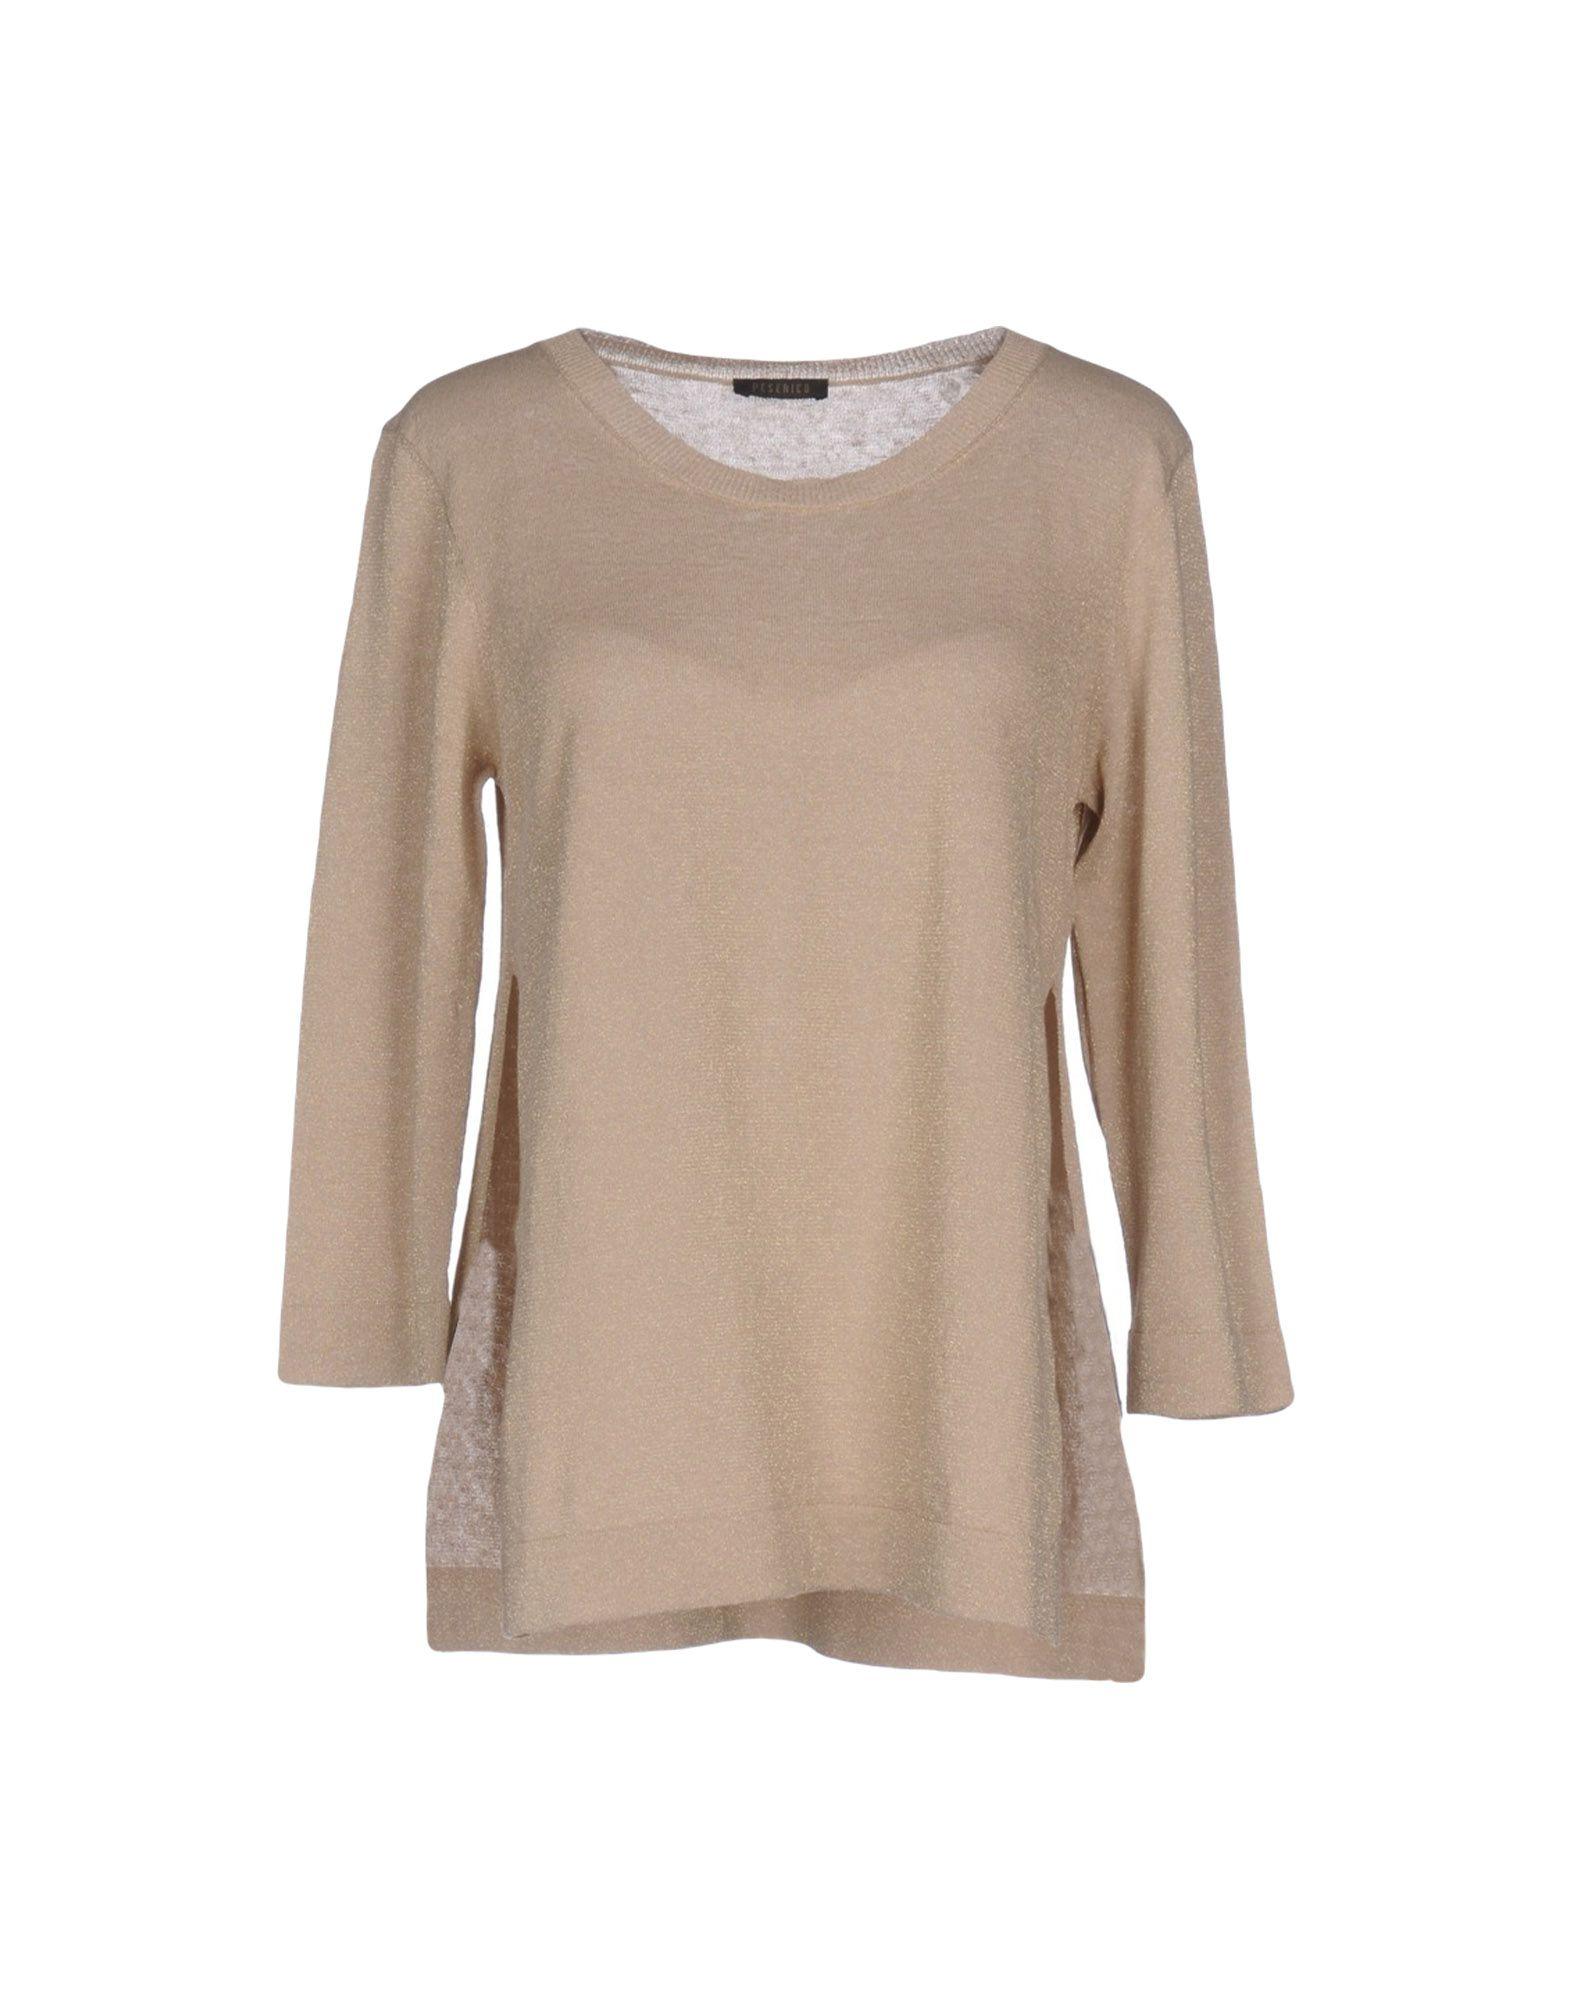 PESERICO Damen Pullover Farbe Sand Größe 5 - broschei